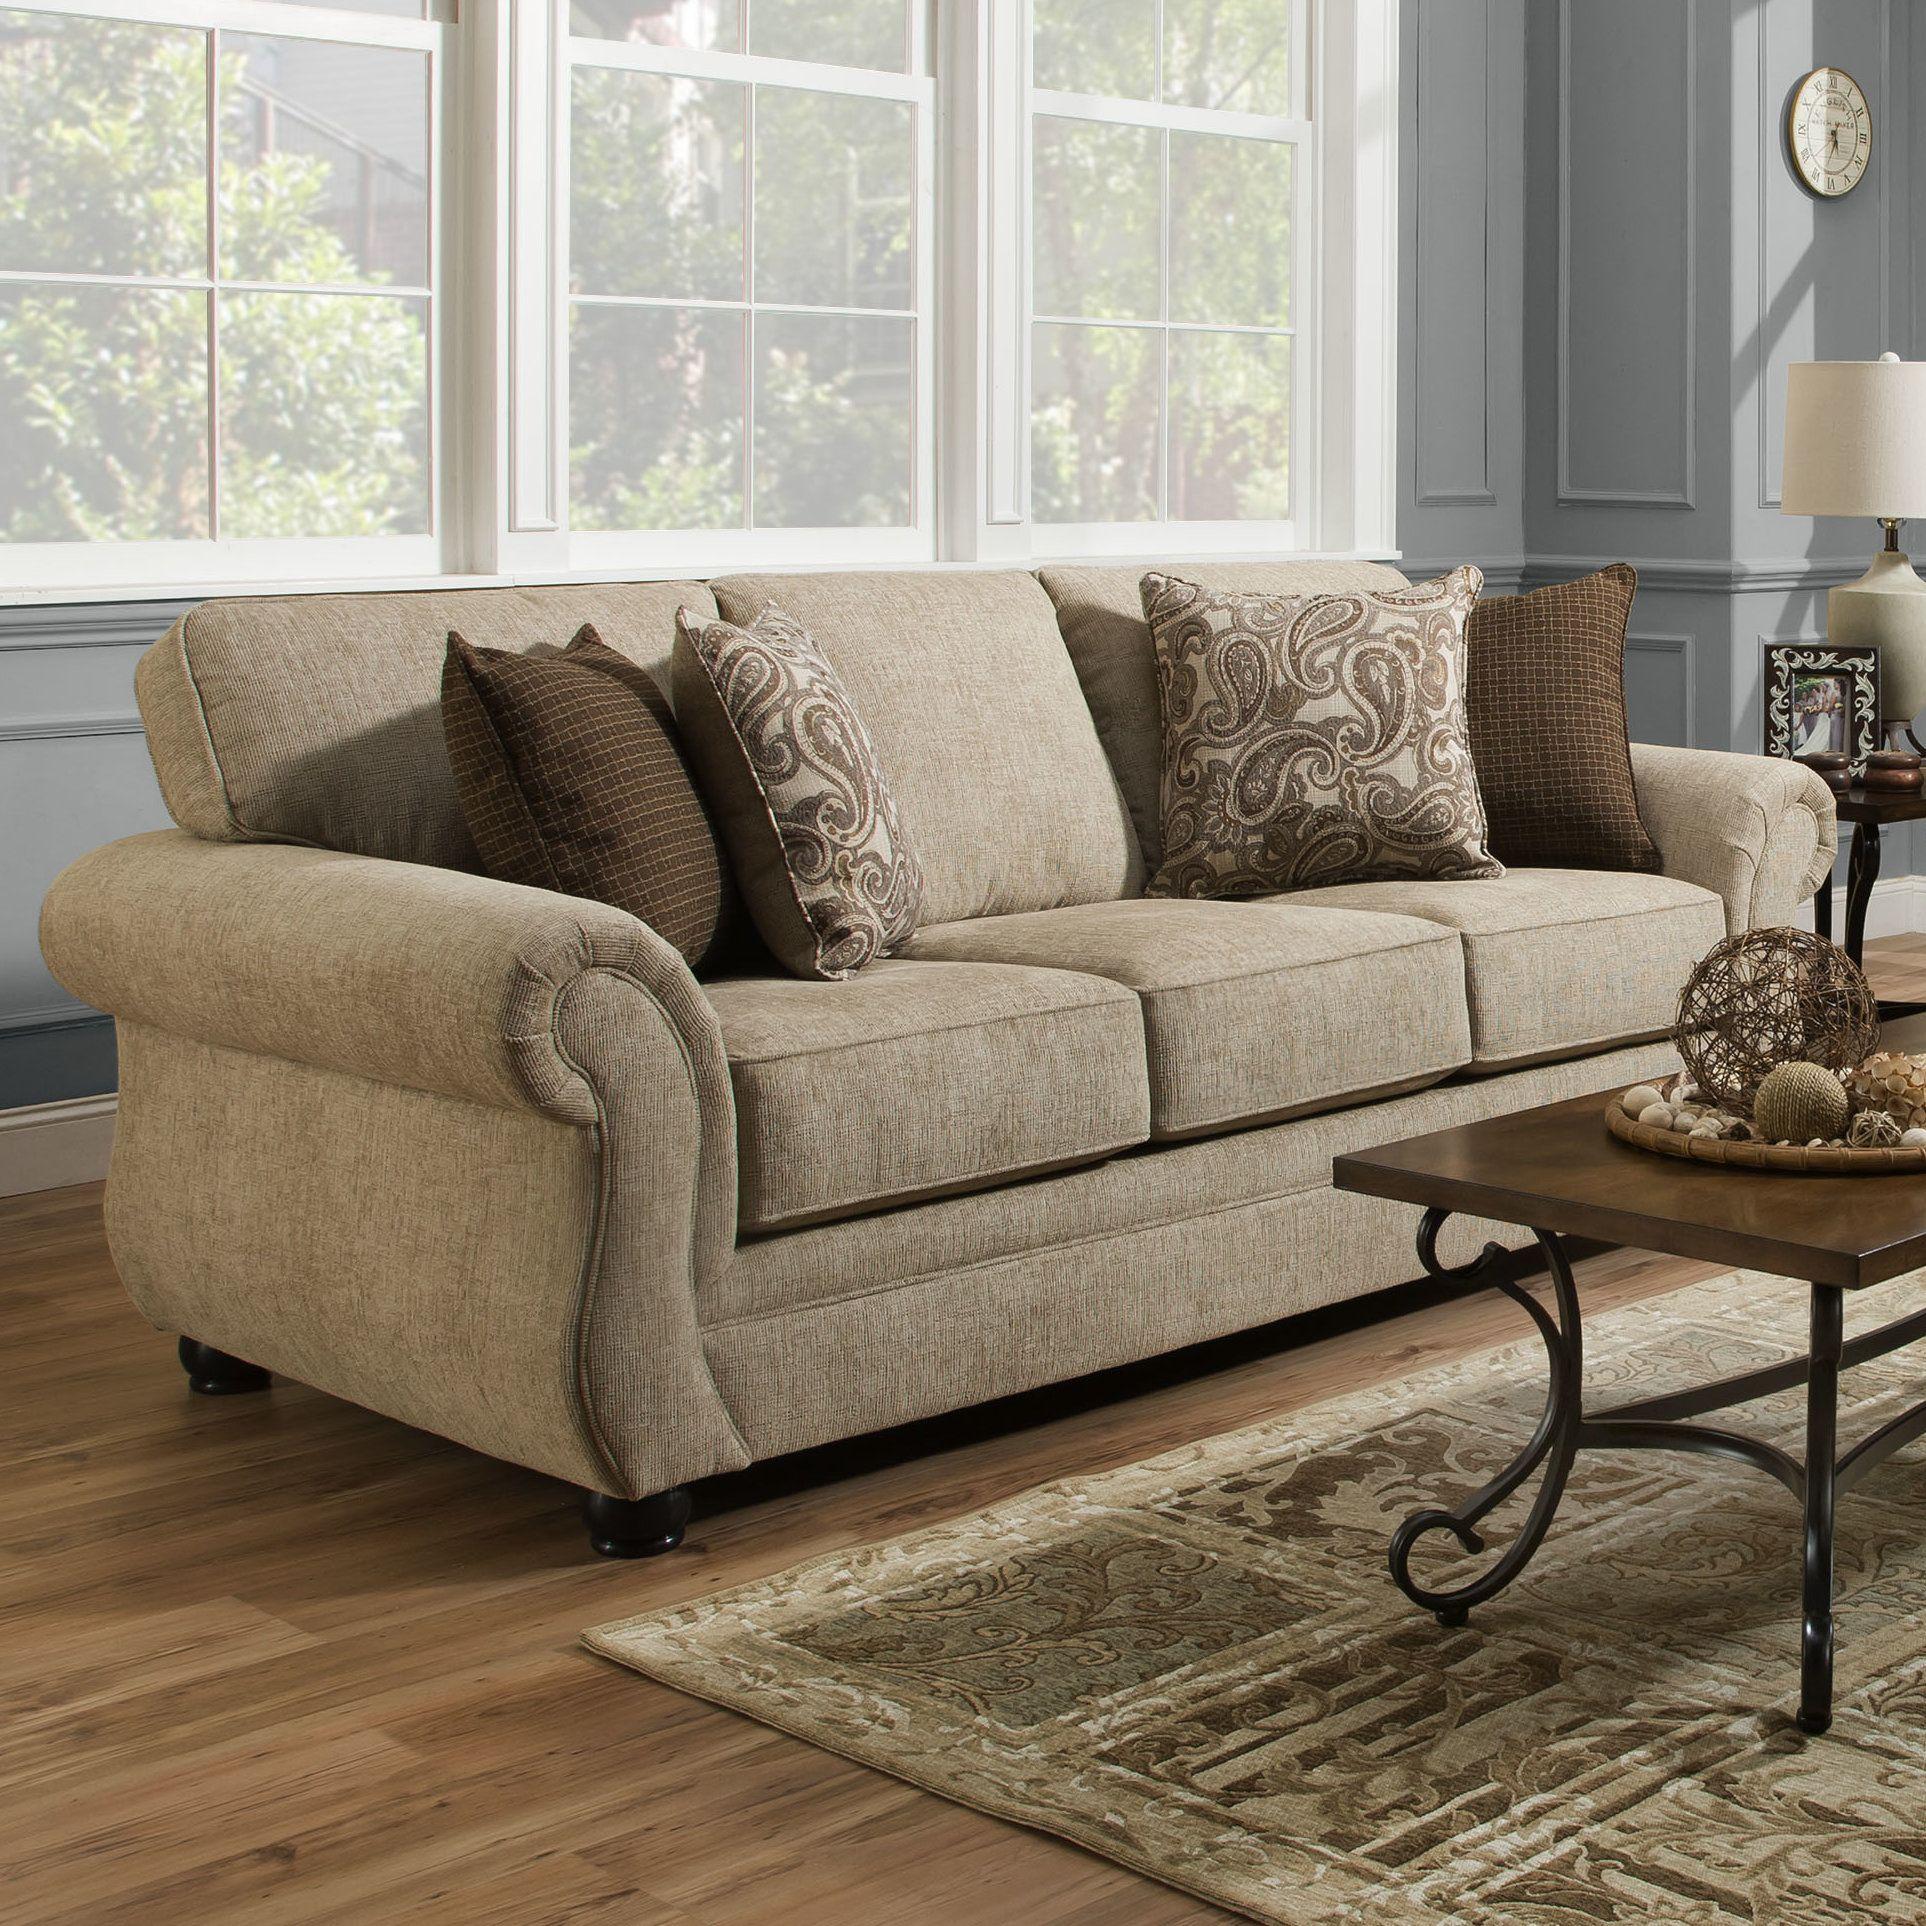 Simmons Vicki Parchment Sofa With Images Sofa Furniture Furniture Sleeper Sofa